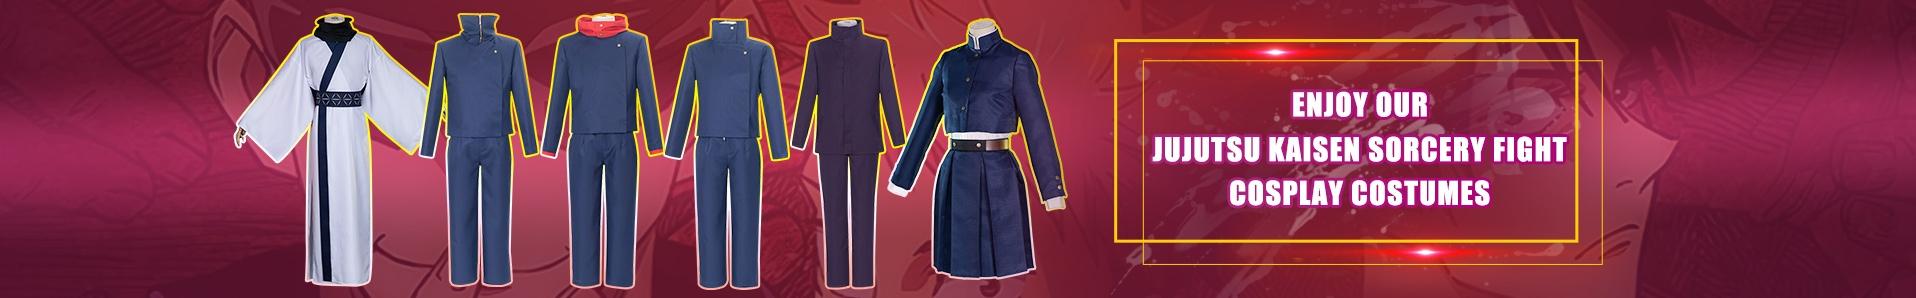 jujutsu kaisen costumes